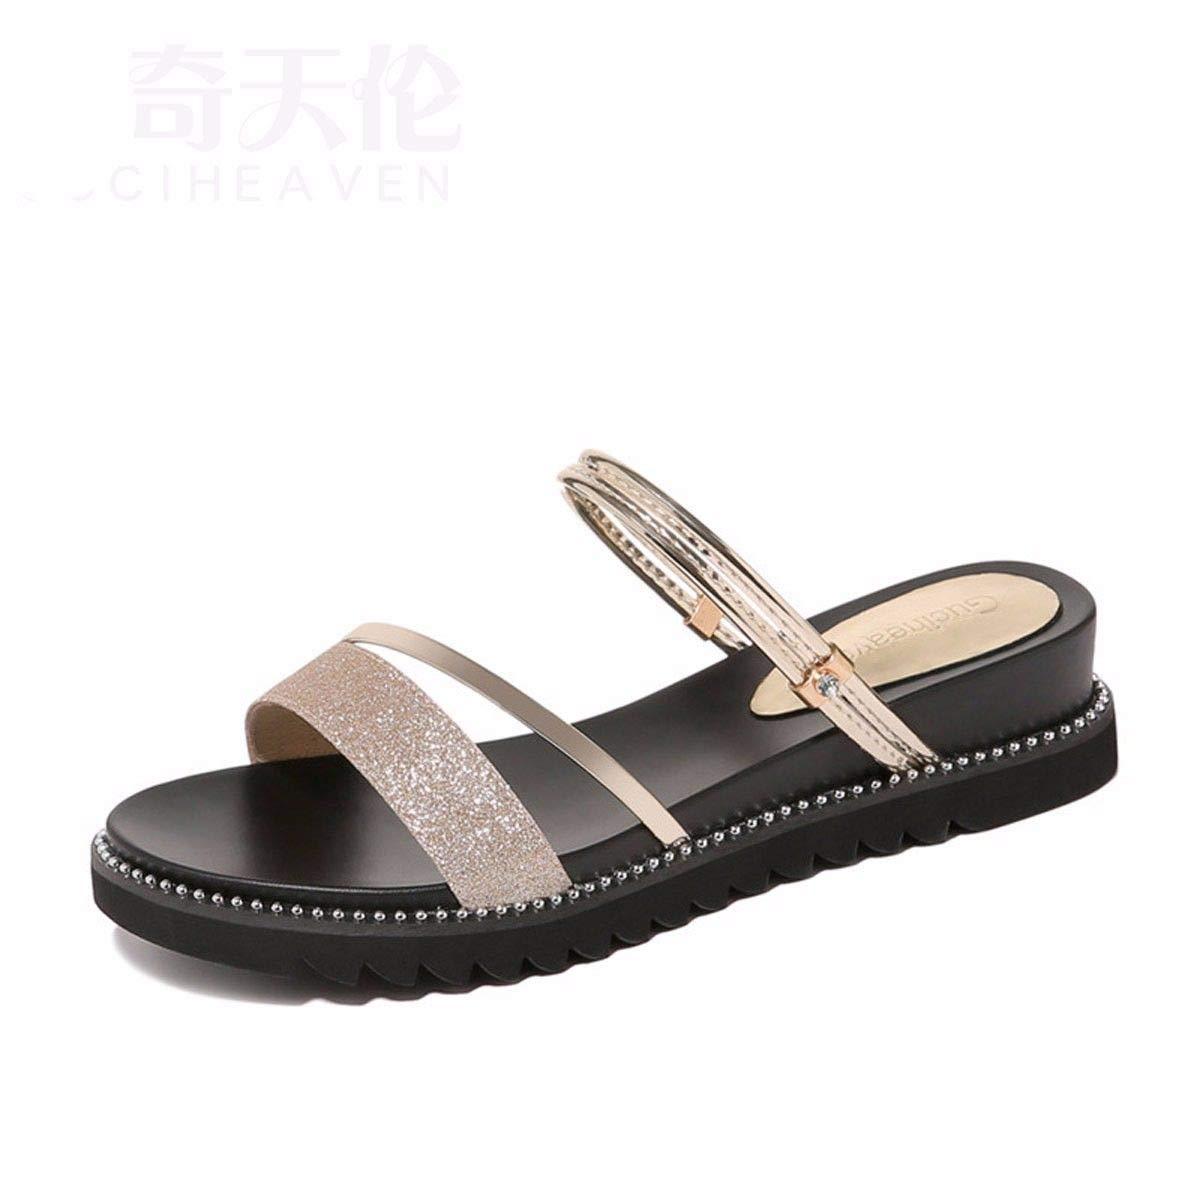 GTVERNH Frauen Schuhe/Meine Damen Strand Hausschuhe Sommer Mode Verschleiß Koreanisch Studenten